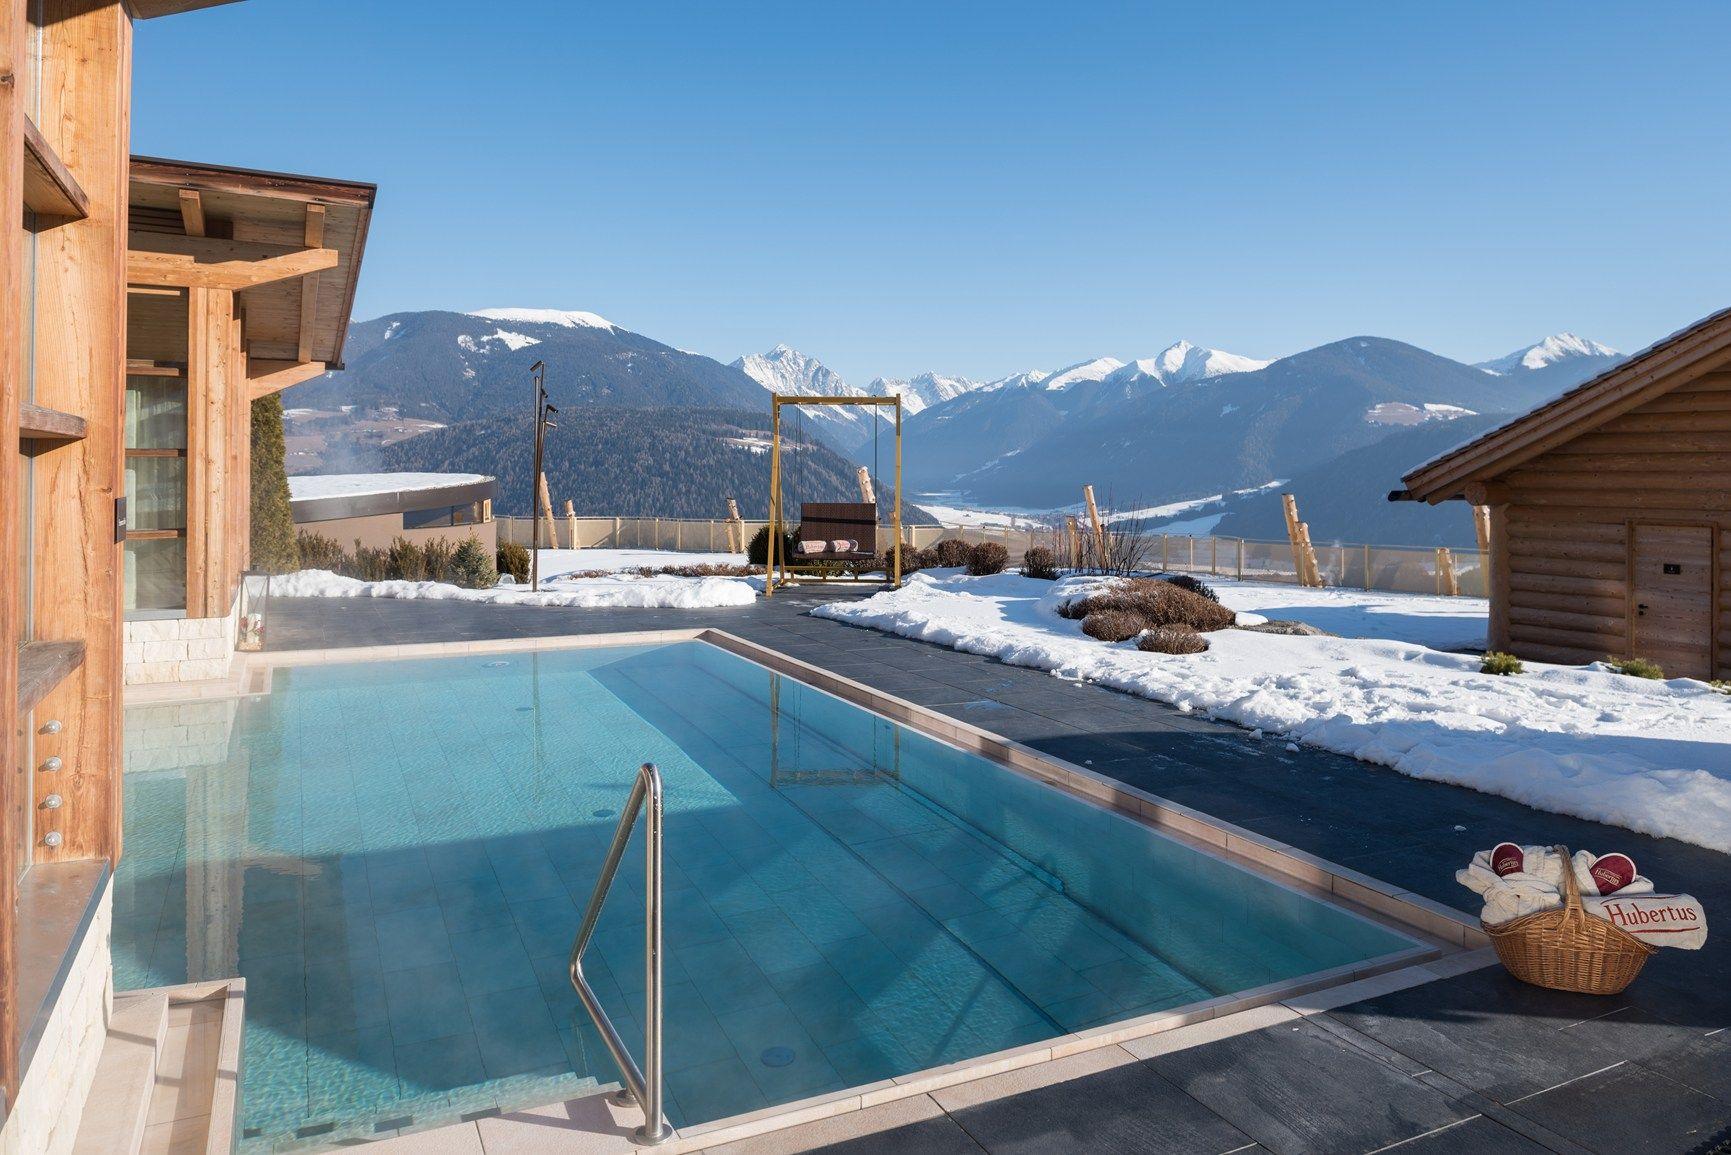 Una piscina sospesa in val pusteria - Hotel hubertus piscina sospesa ...